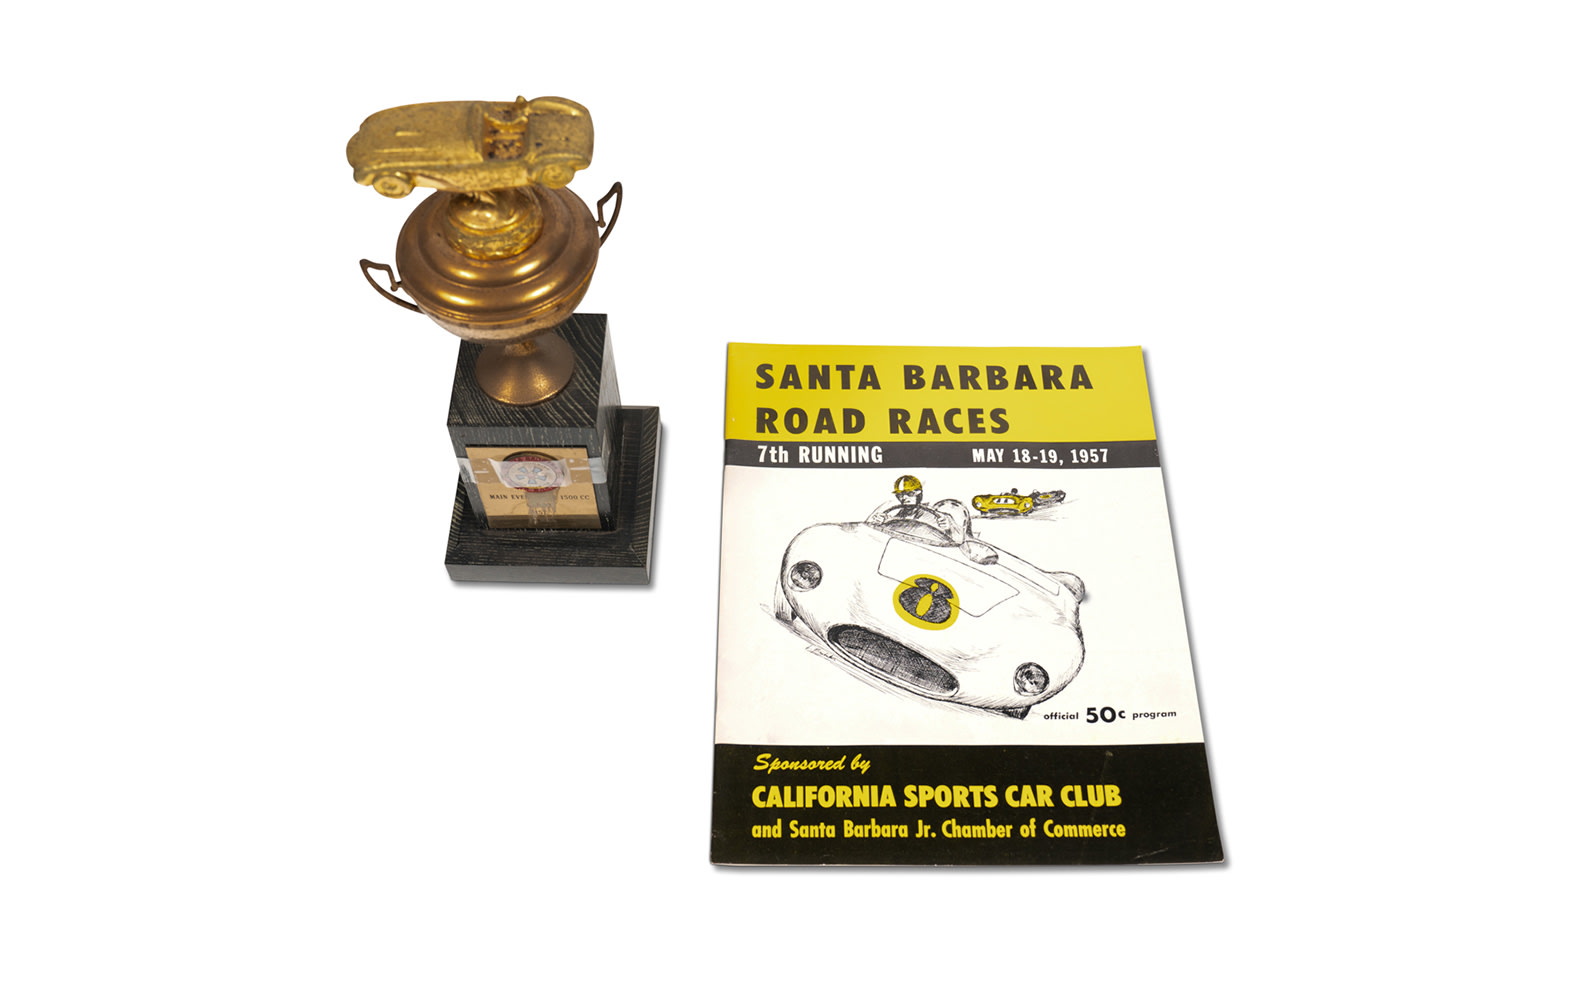 1957 CSCC Santa Barbara Road Races Trophy and Official Race Program